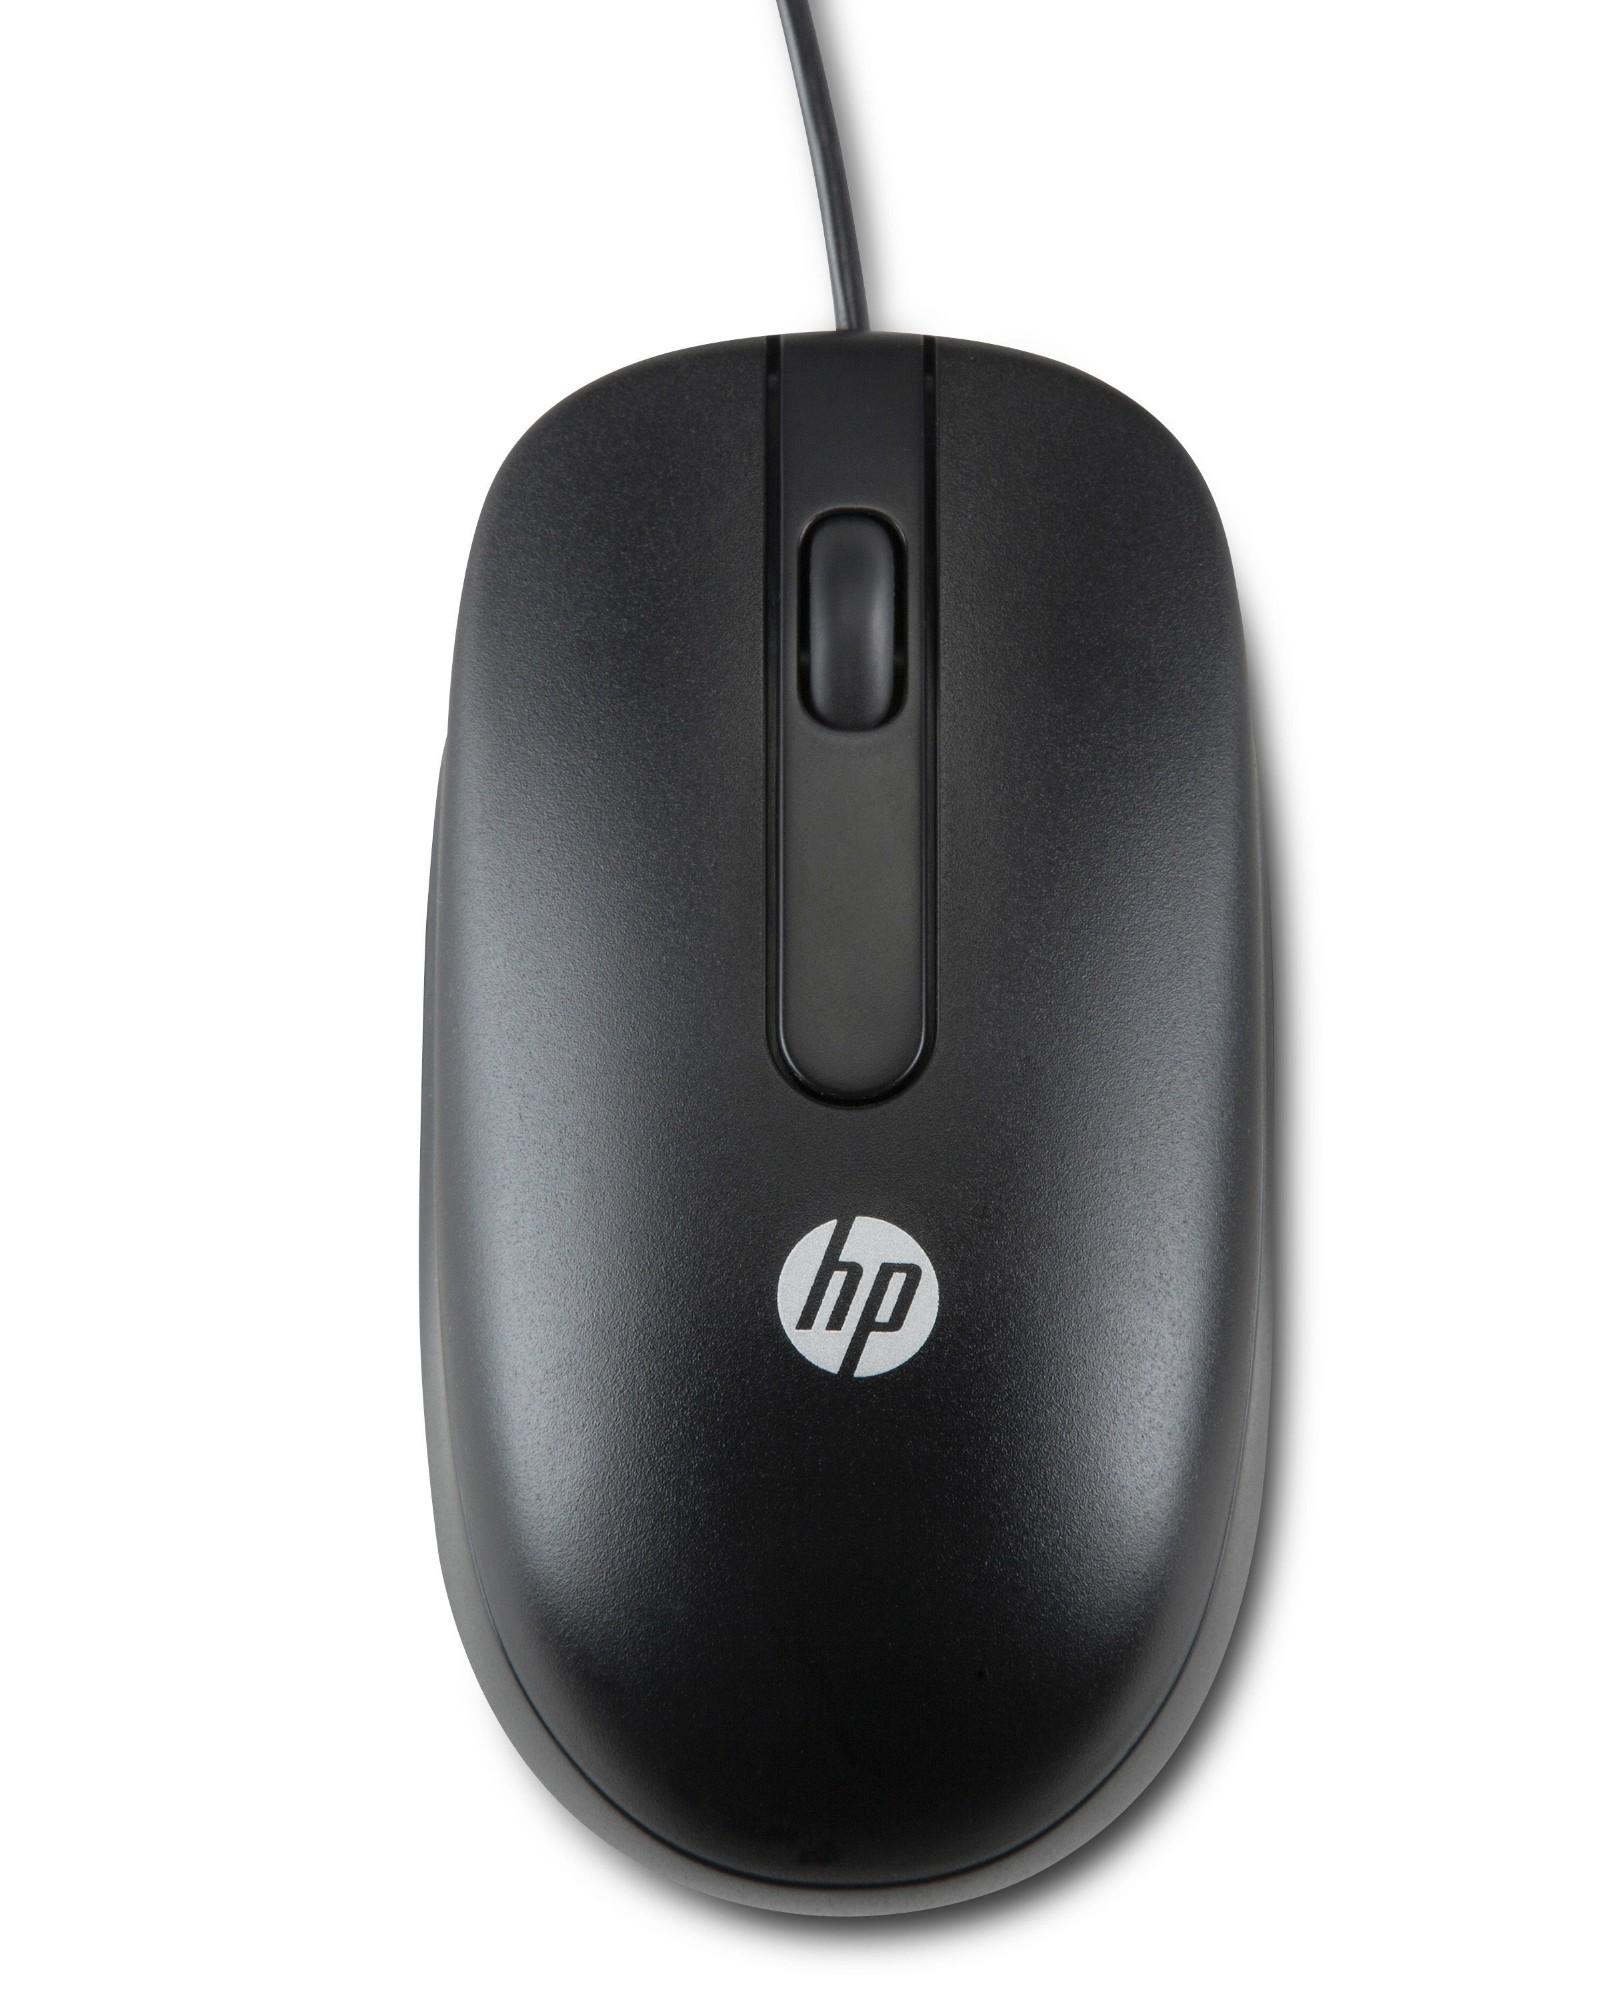 HP USB lasermuis, 1000 dpi